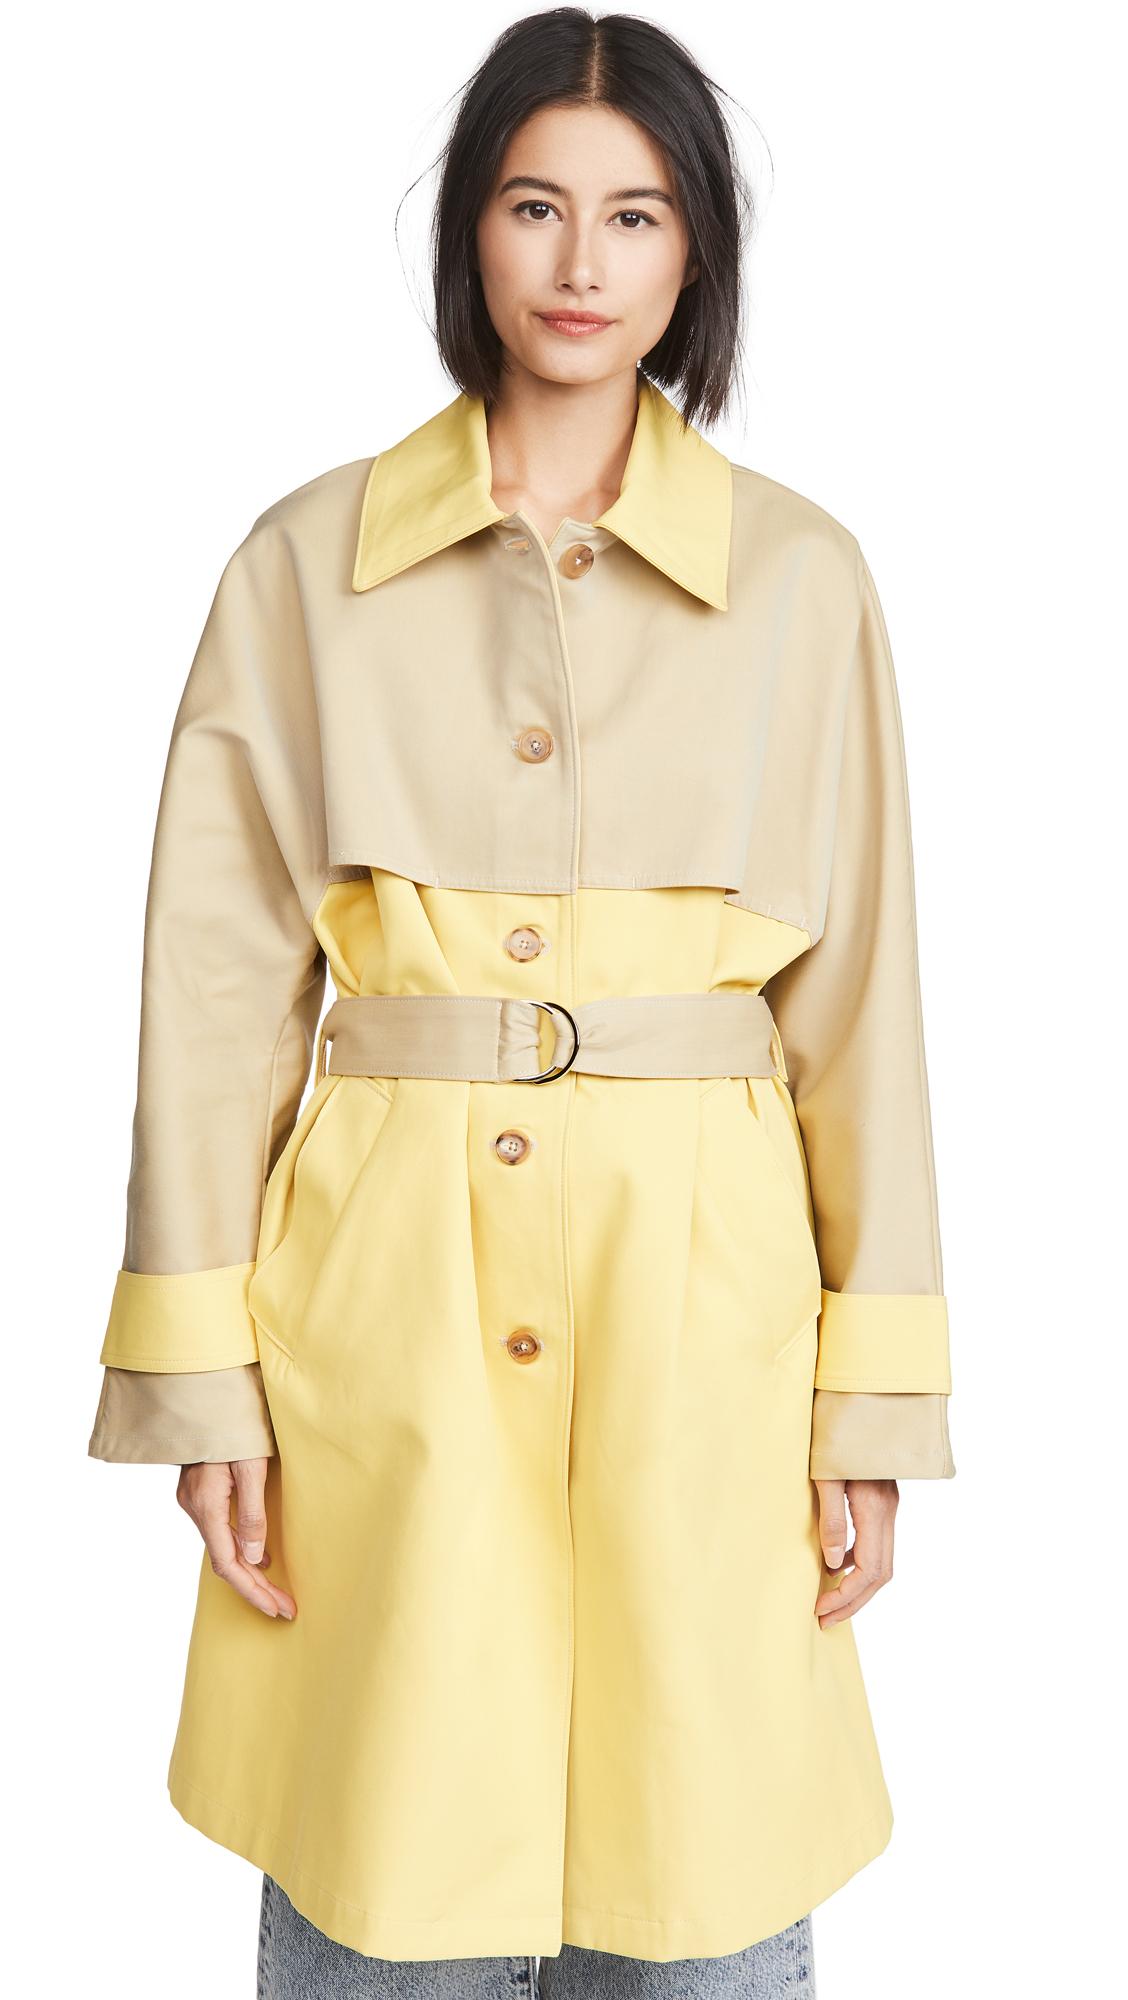 Buy ei8htdreams Roma Techno Cotton Trench Coat online beautiful ei8htdreams Jackets, Coats, Trench Coats